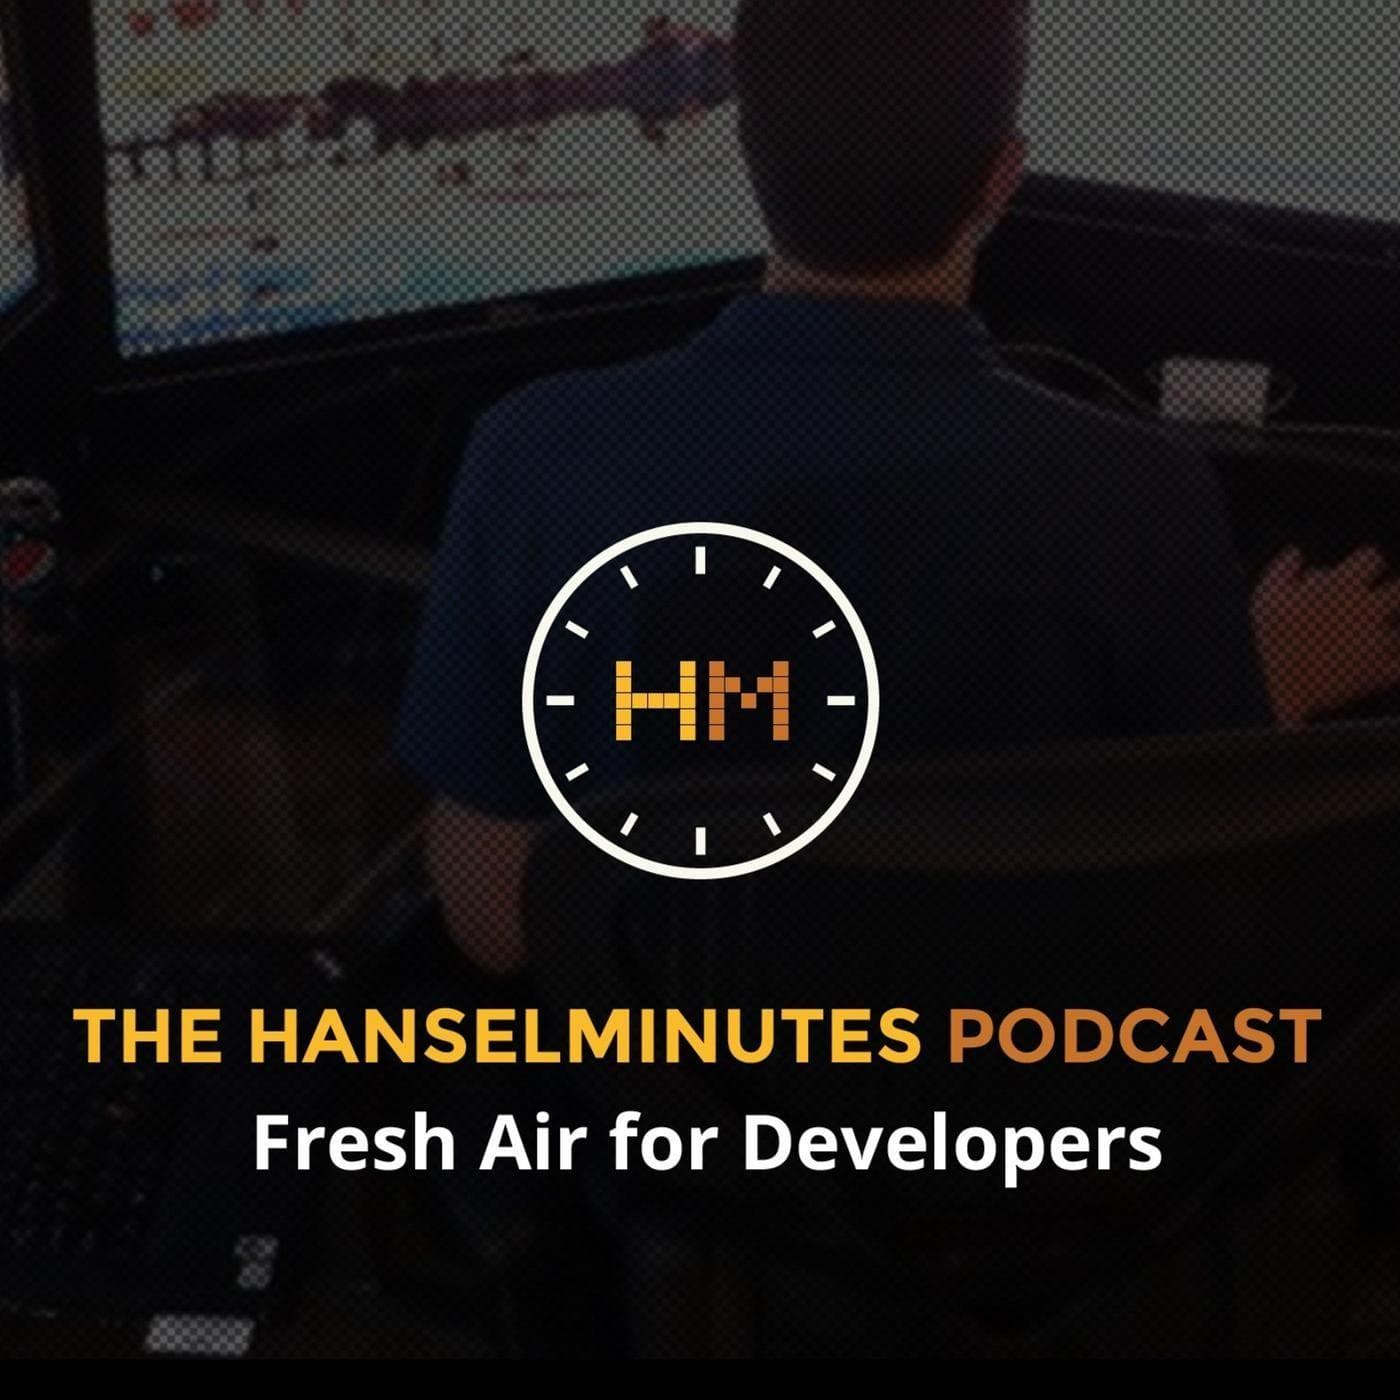 Random Best Tech Podcasts